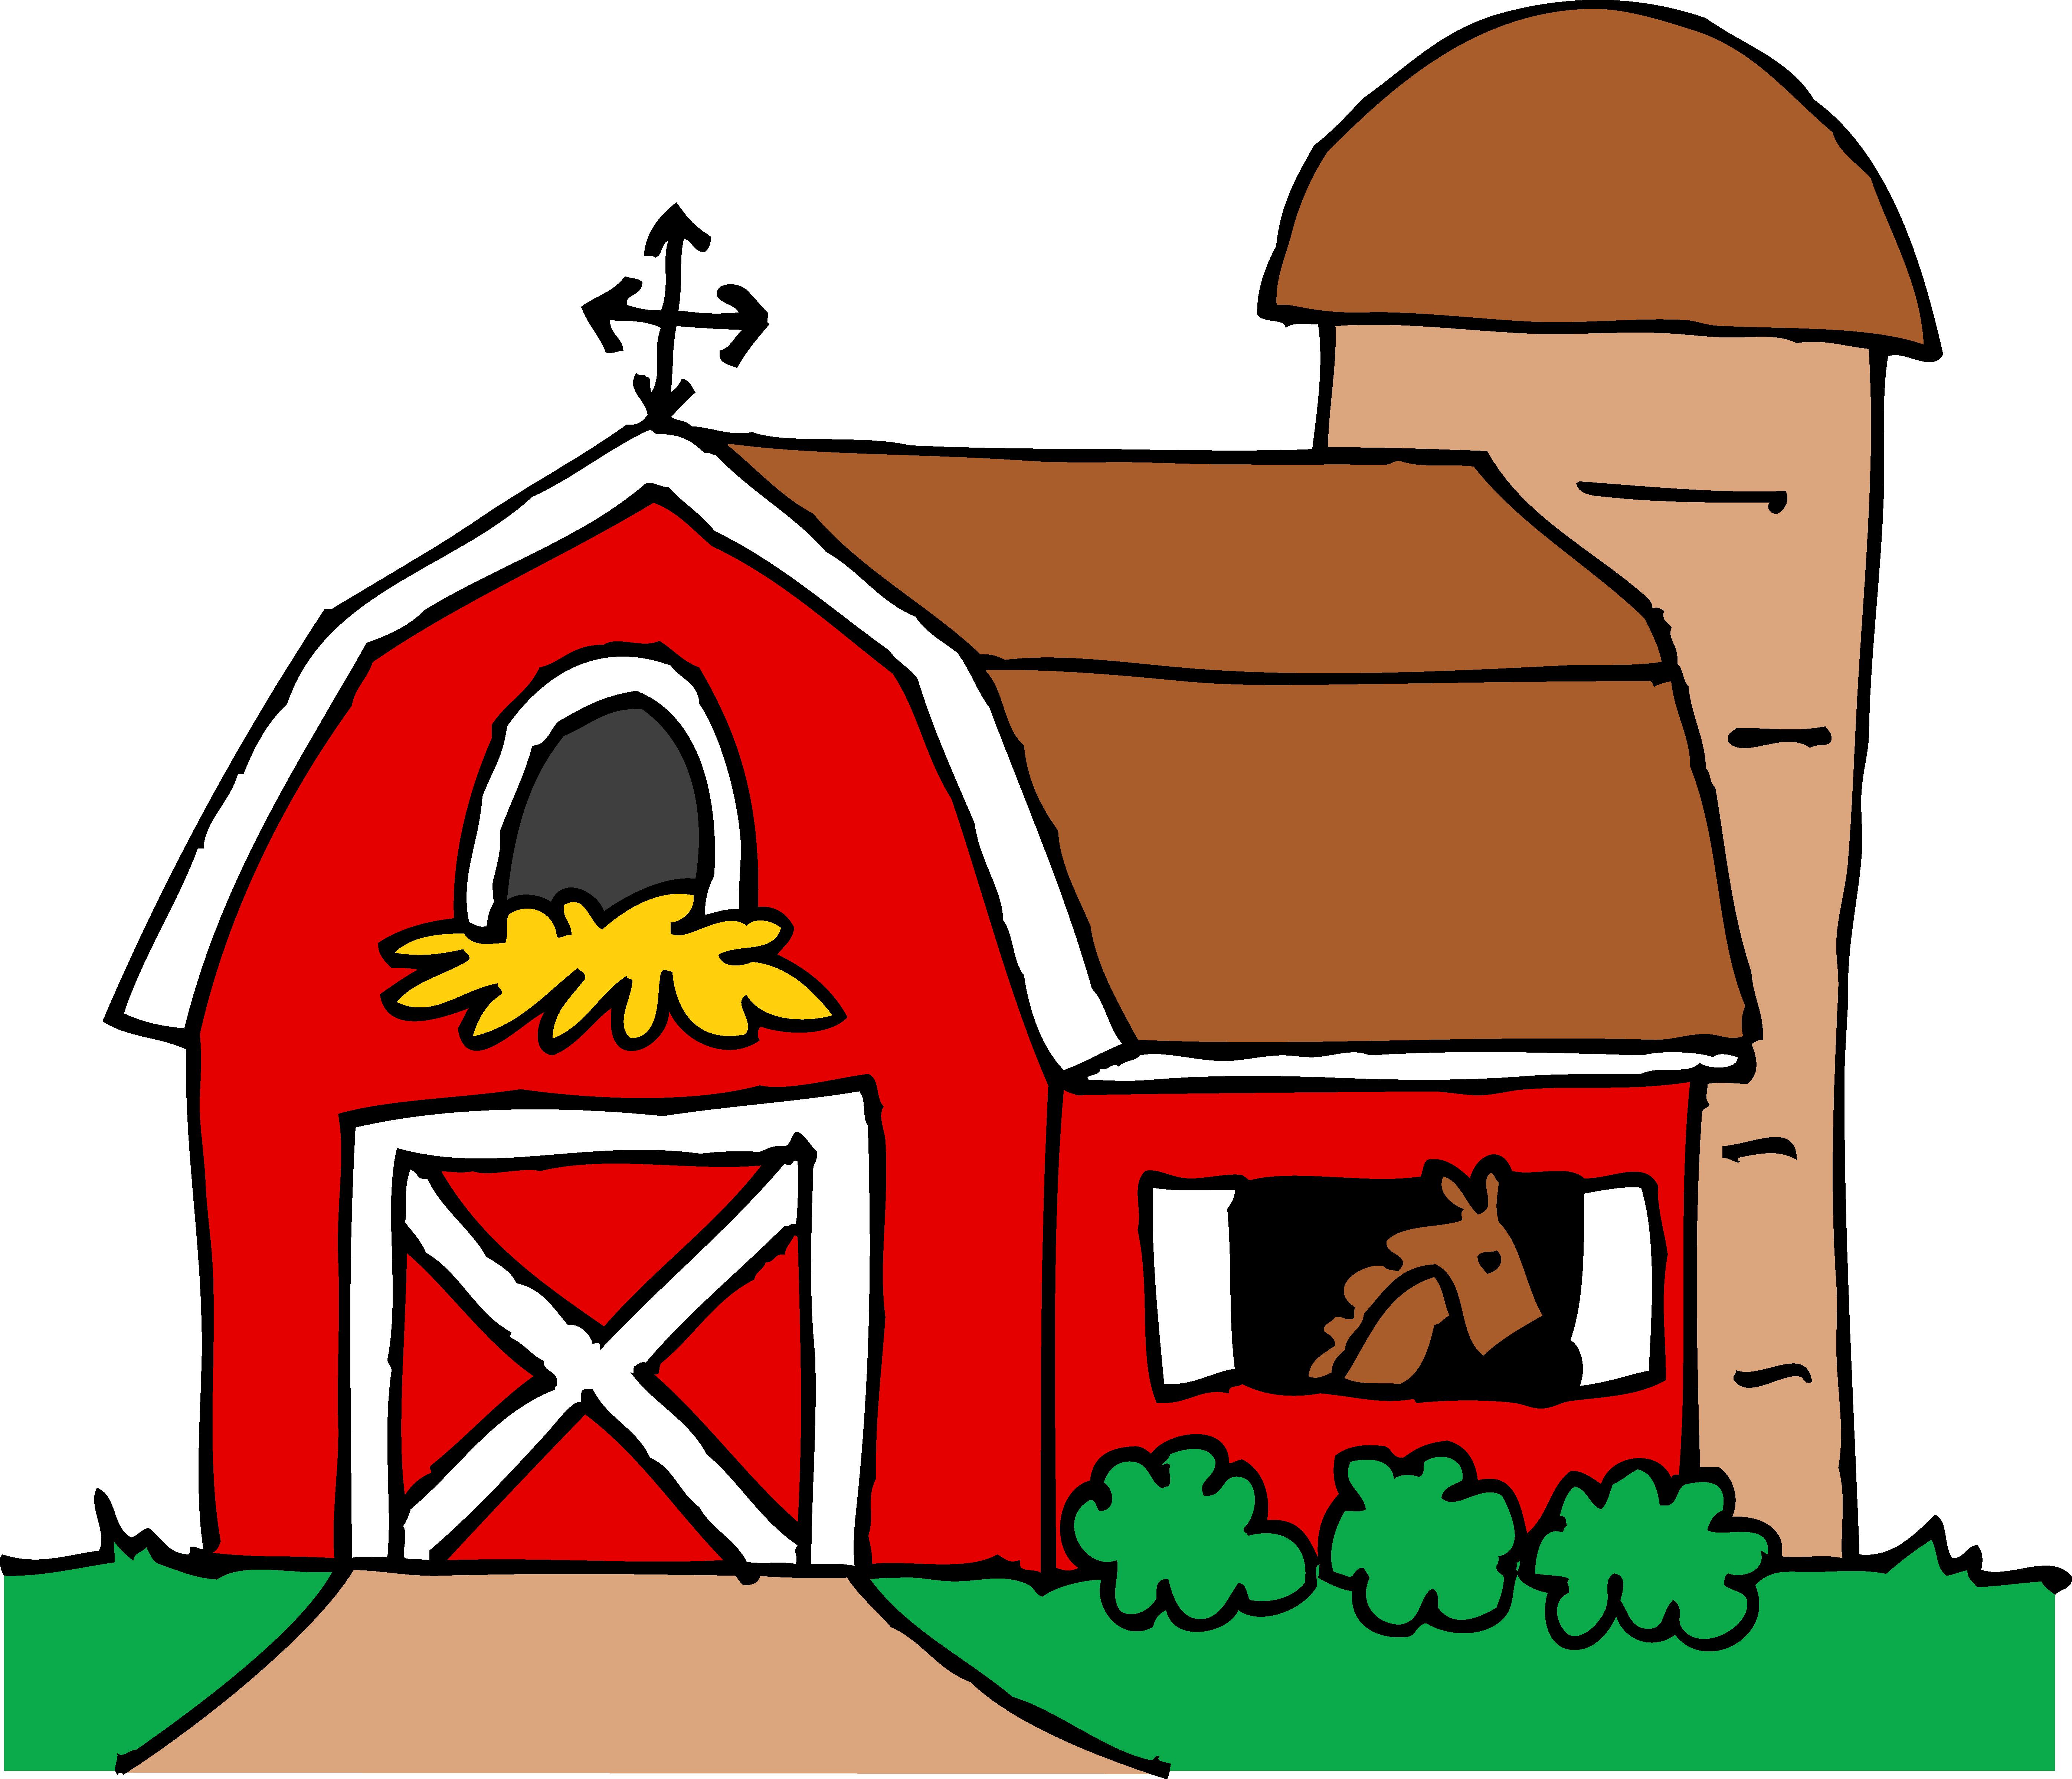 Transparent ranch clipart svg freeuse download Barn Silo Farm Clip art - Barn Cliparts Template png ... svg freeuse download